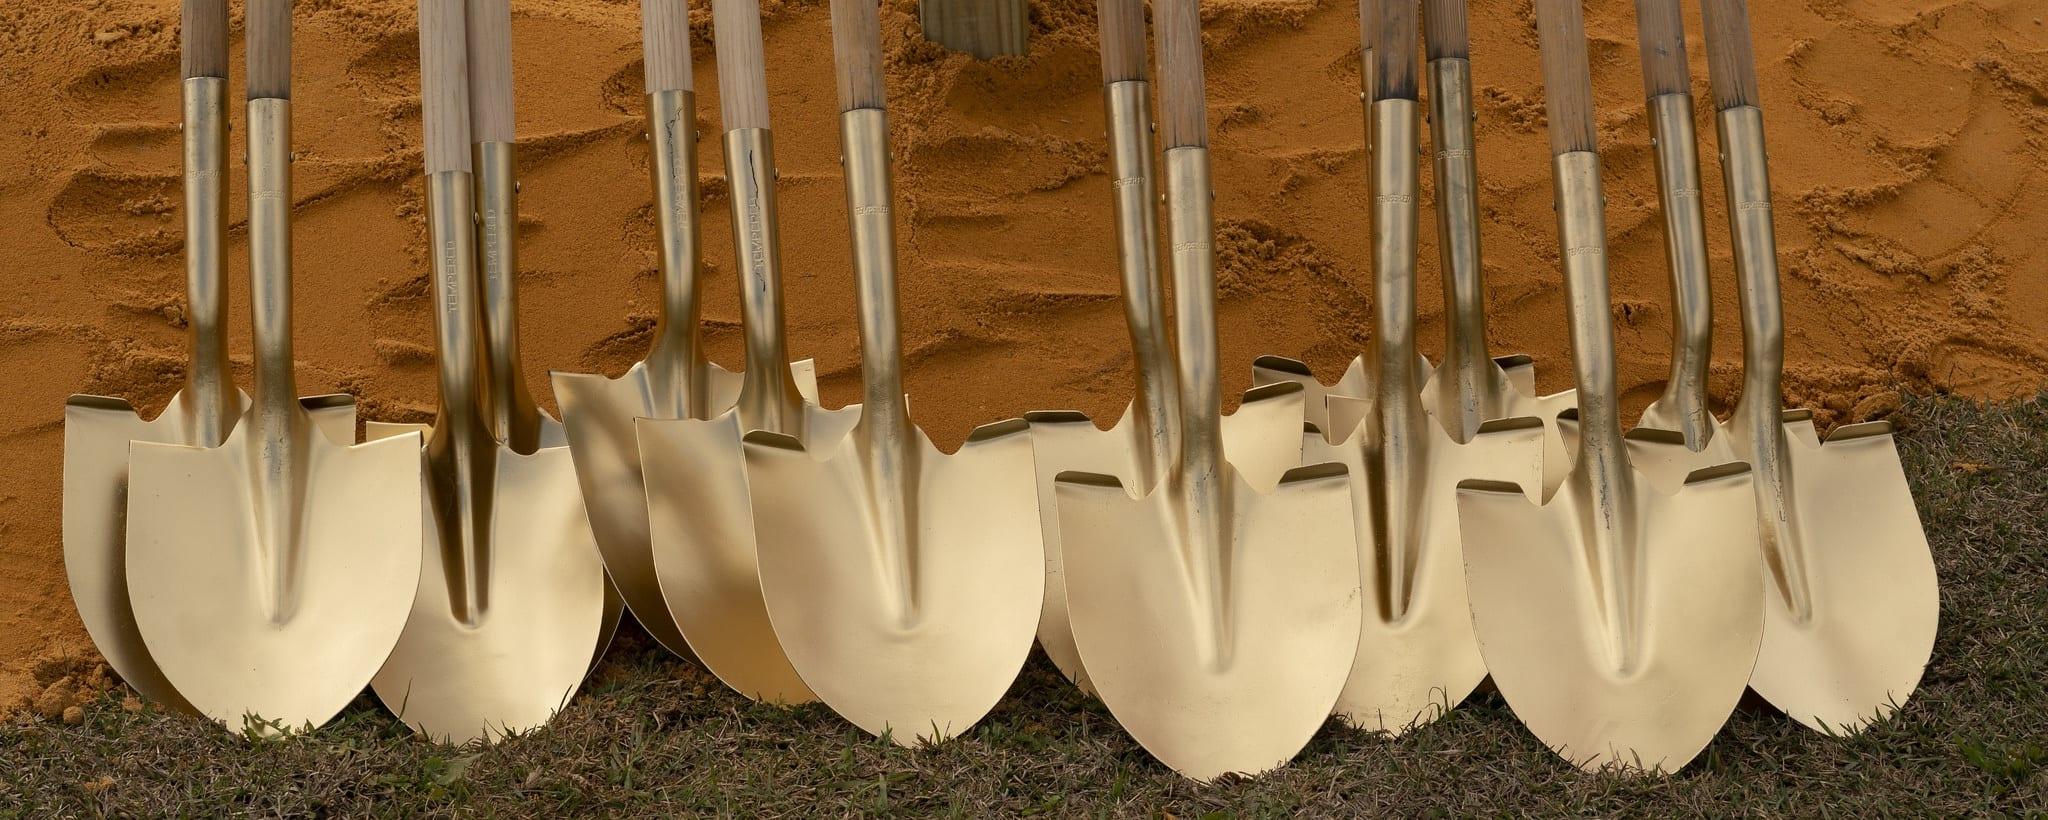 Coastal-Growers-Shovels